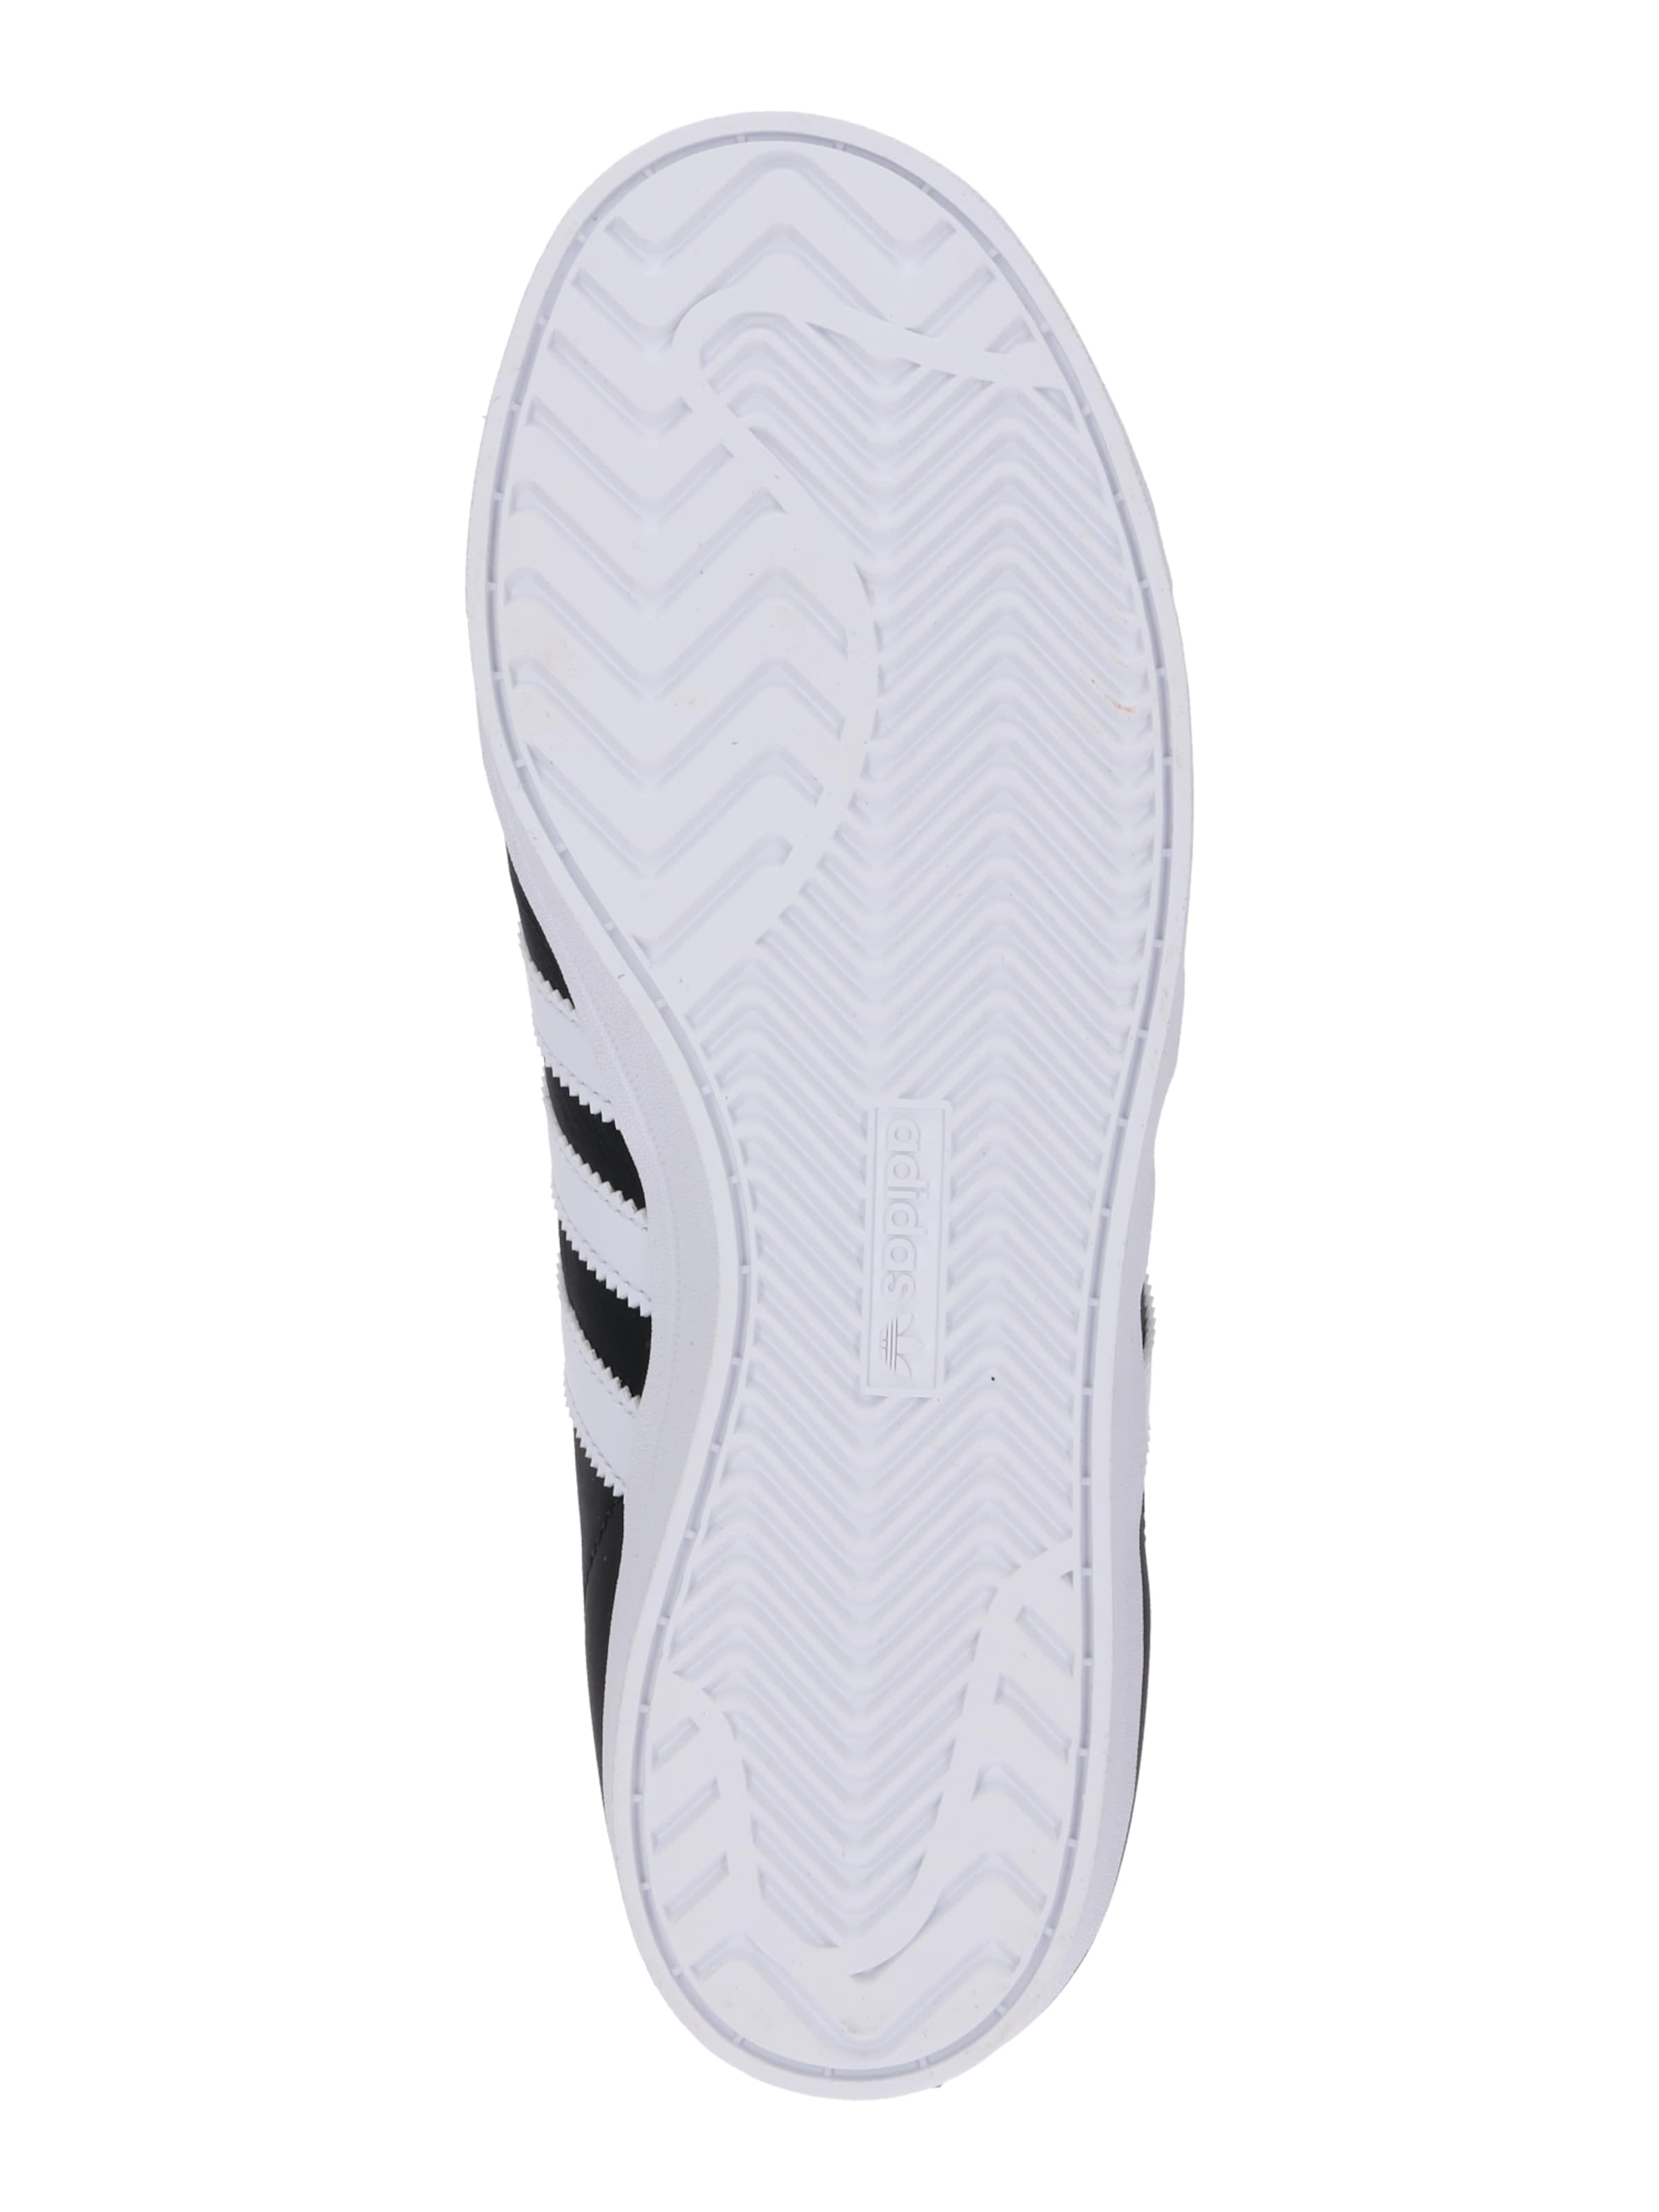 Basses In Adidas Star' OriginalsBaskets 'coast NoirBlanc 8n0mvNw